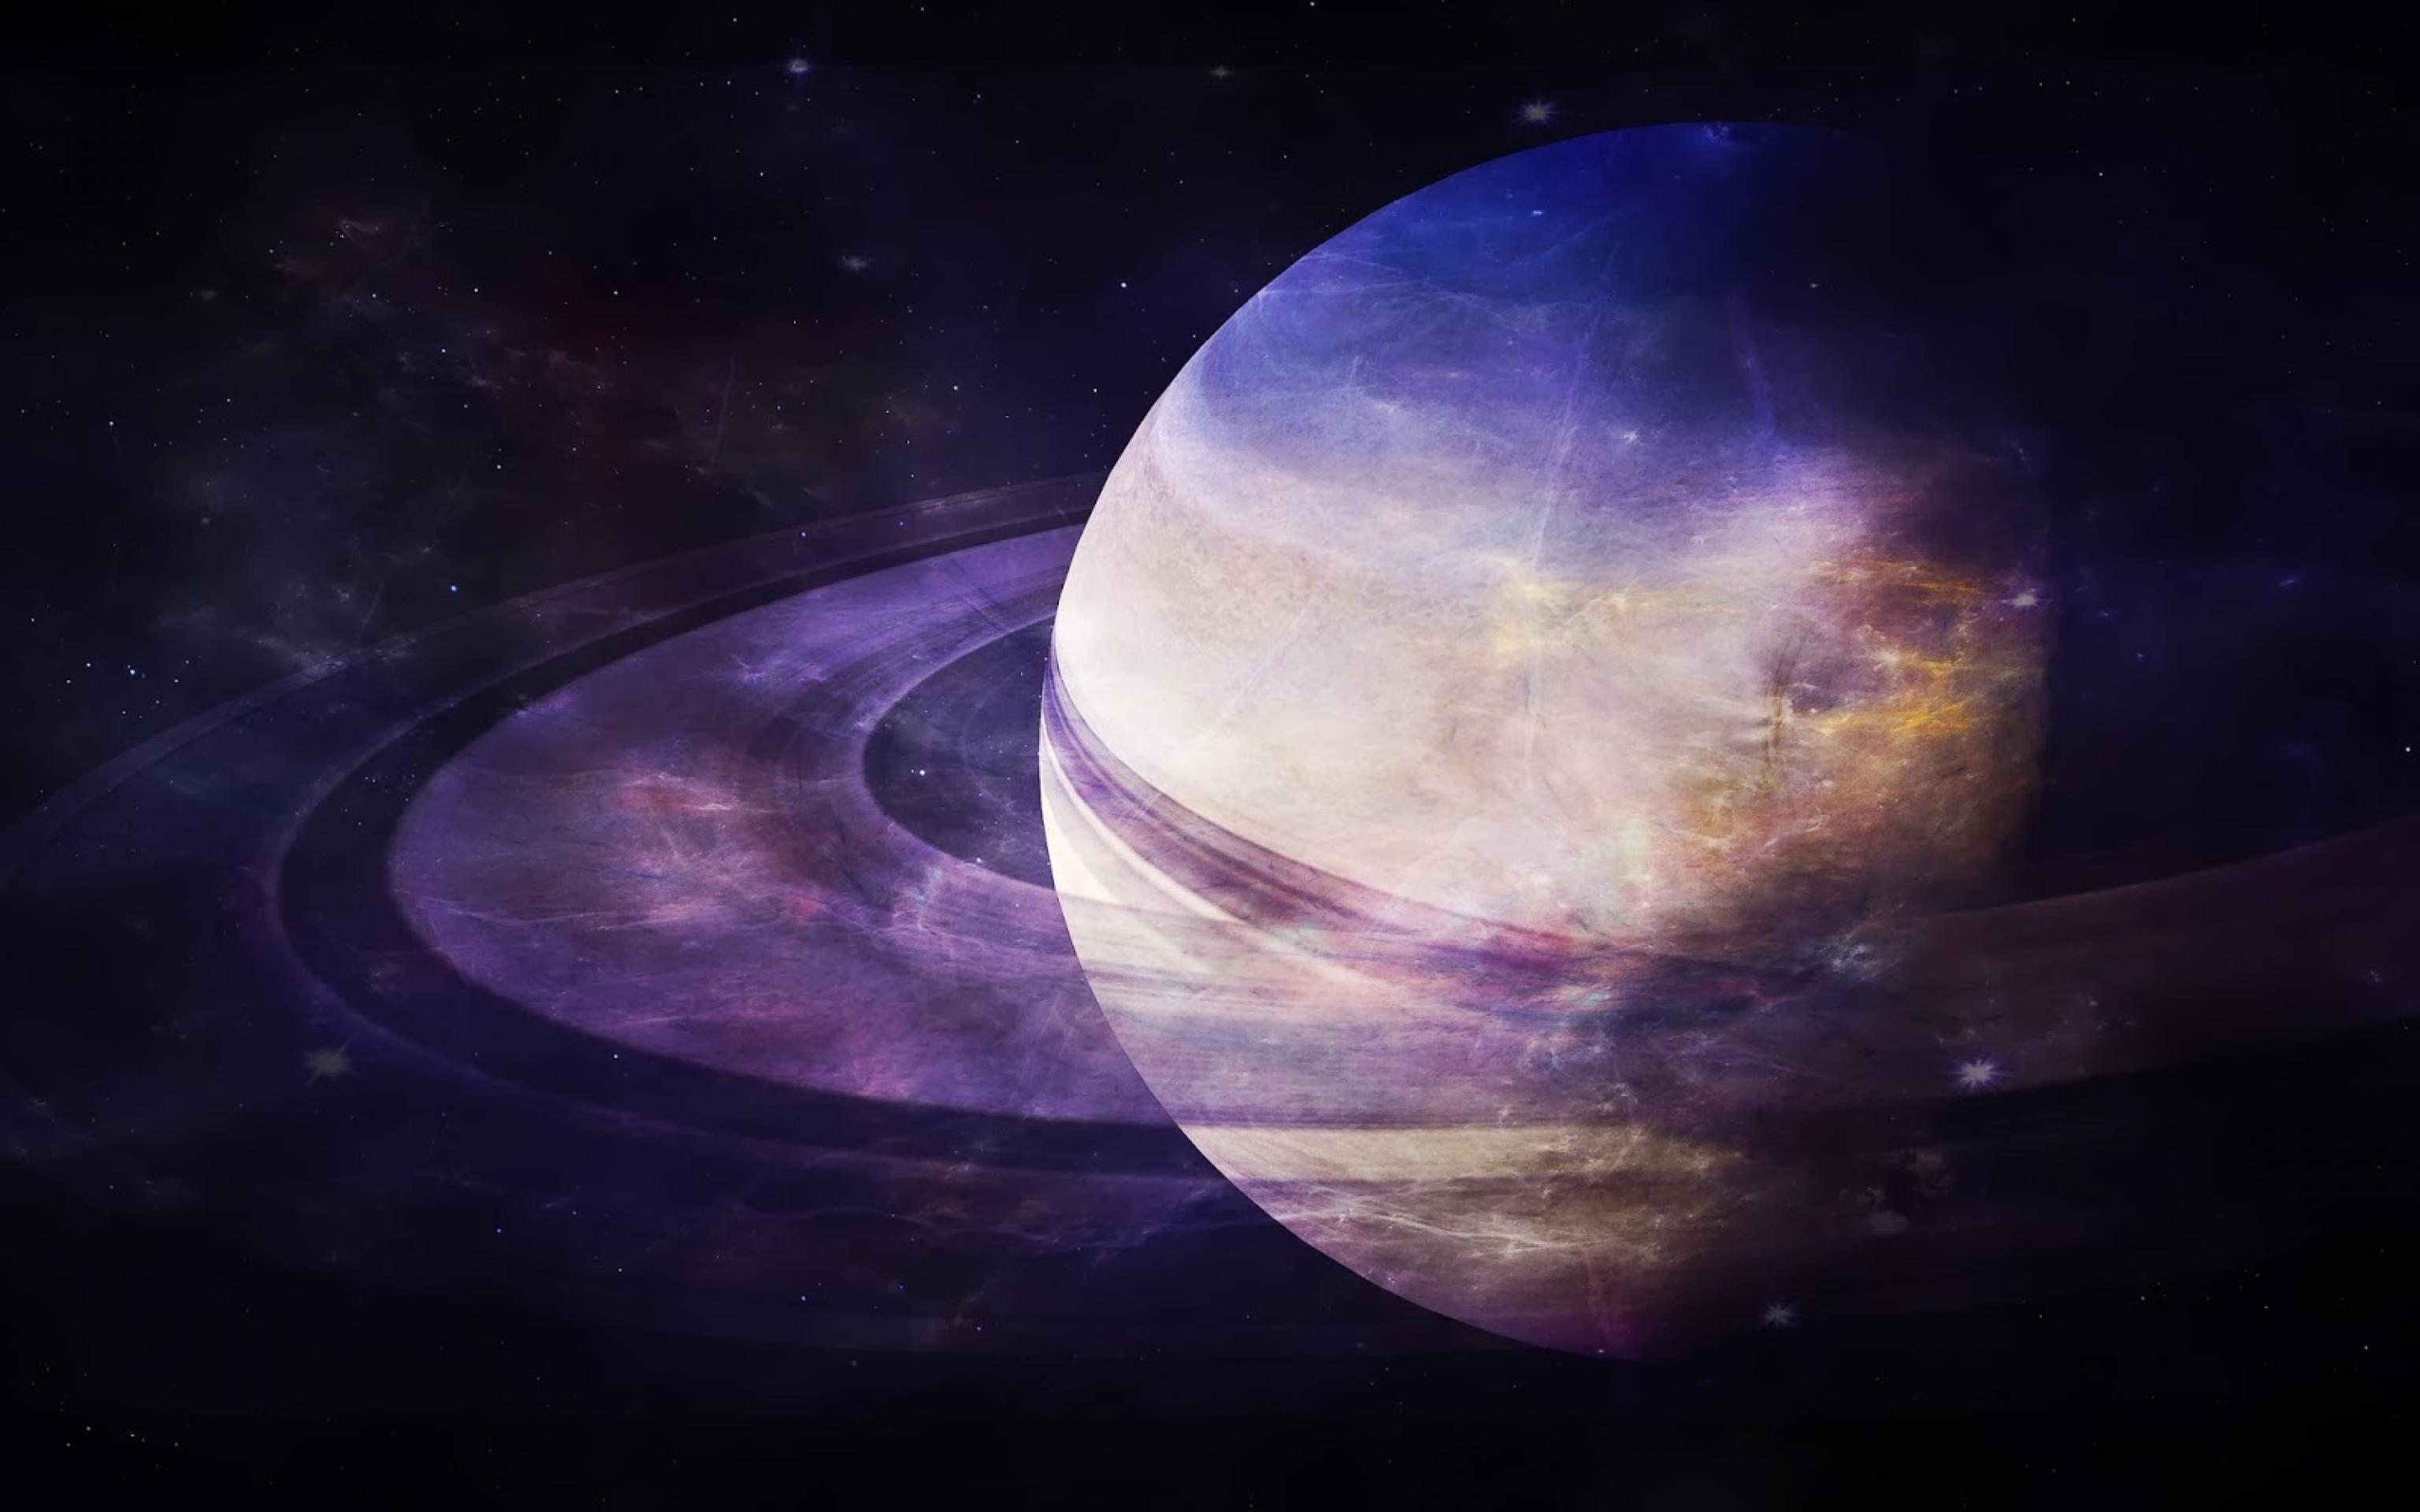 САТУРН. УРАН. ХИРОН. Влияние планет на нашу жизнь.